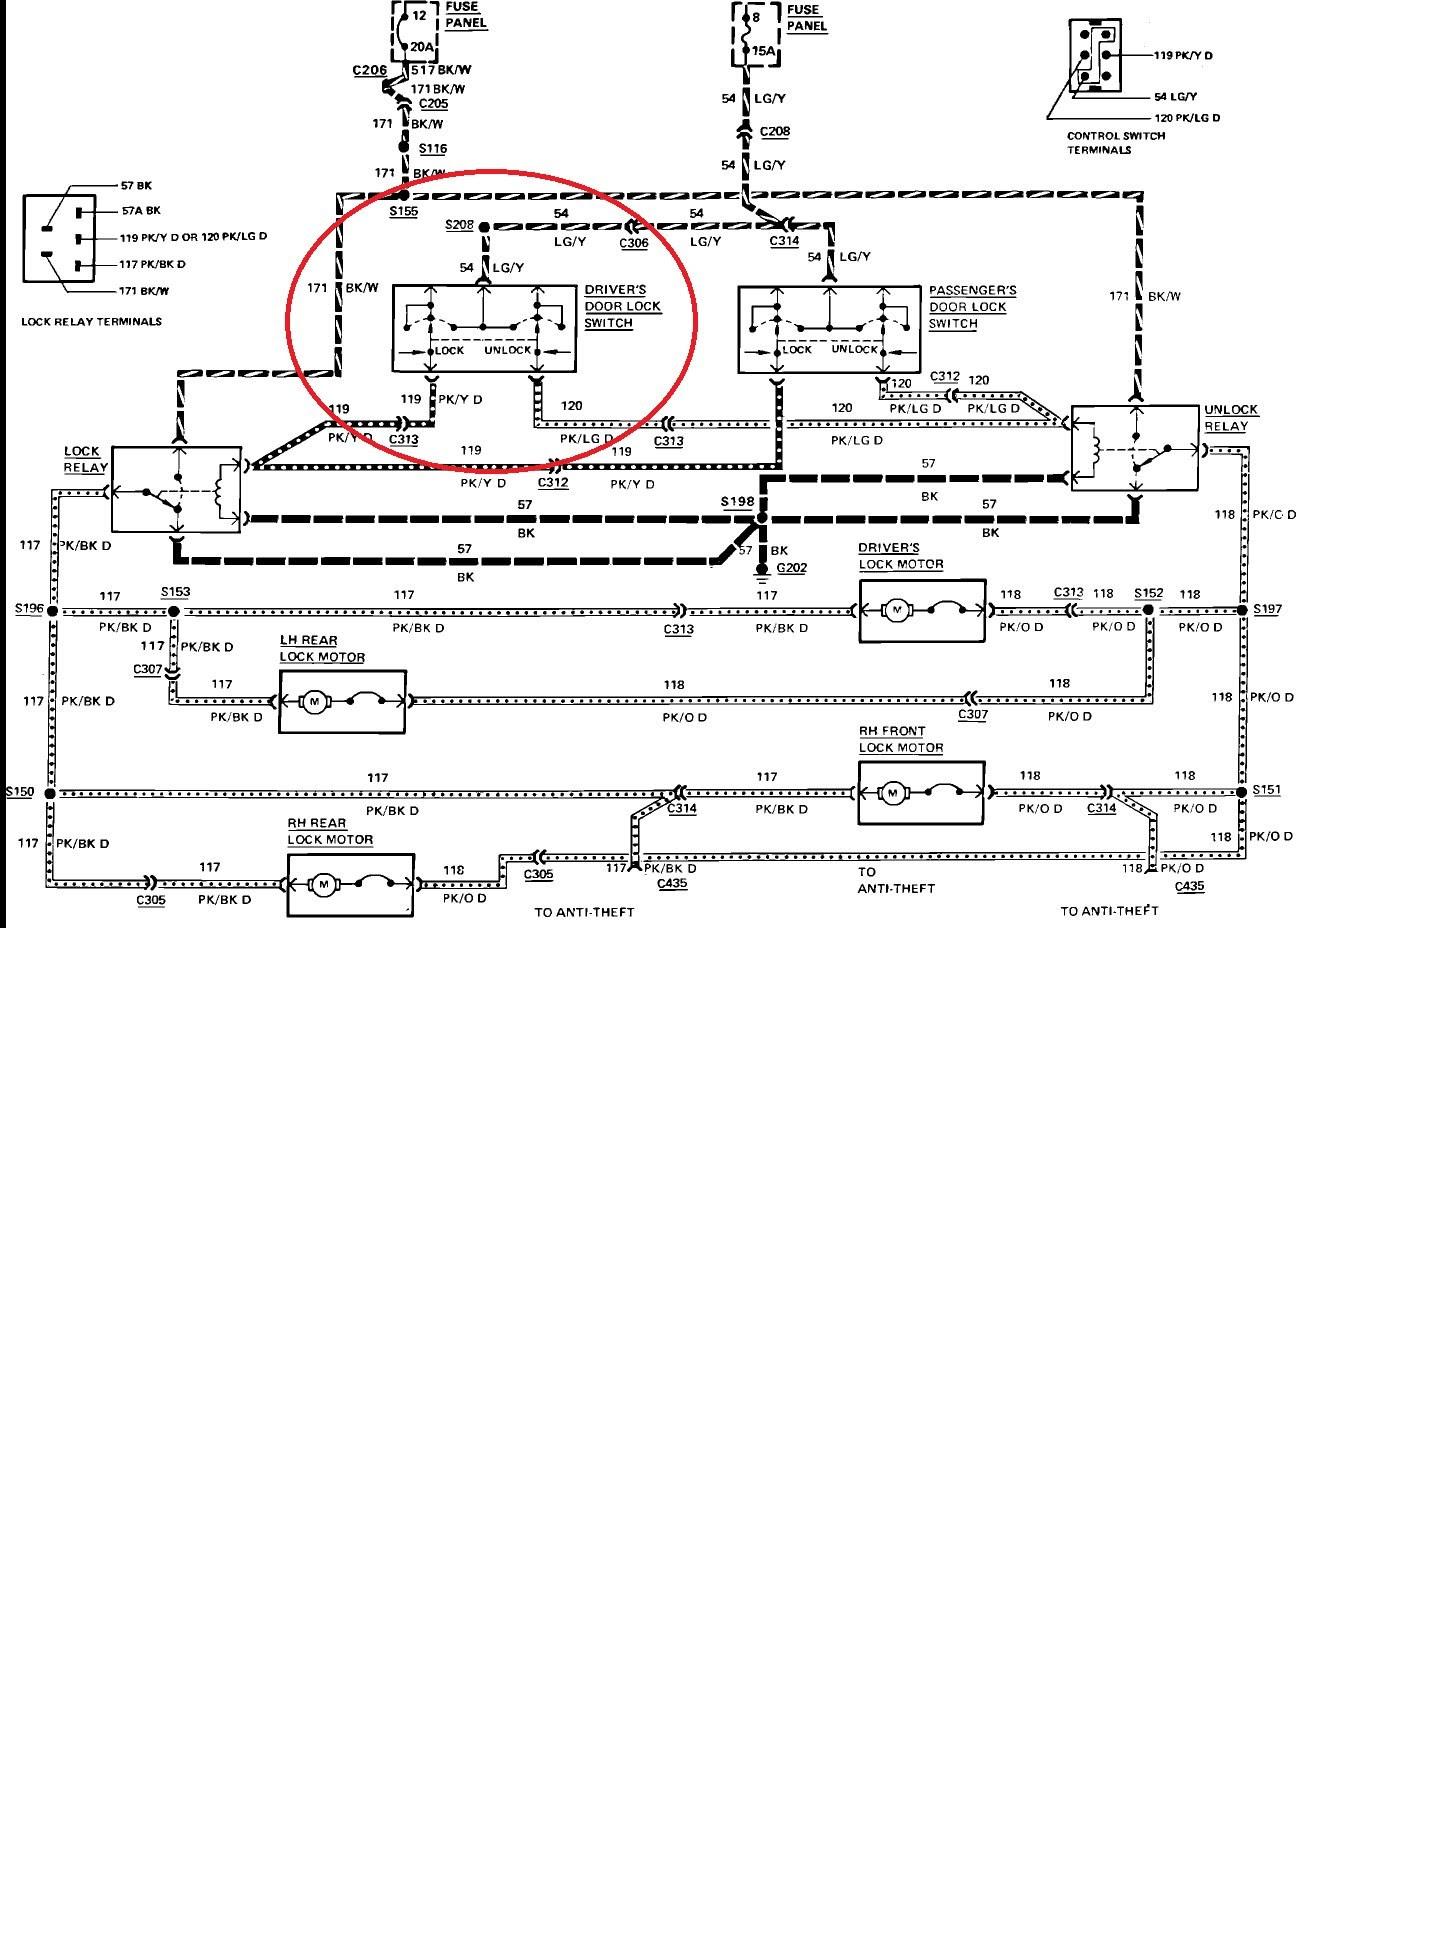 99 Lincoln Continental Fuse Box Diagram - Wiring Diagram ...